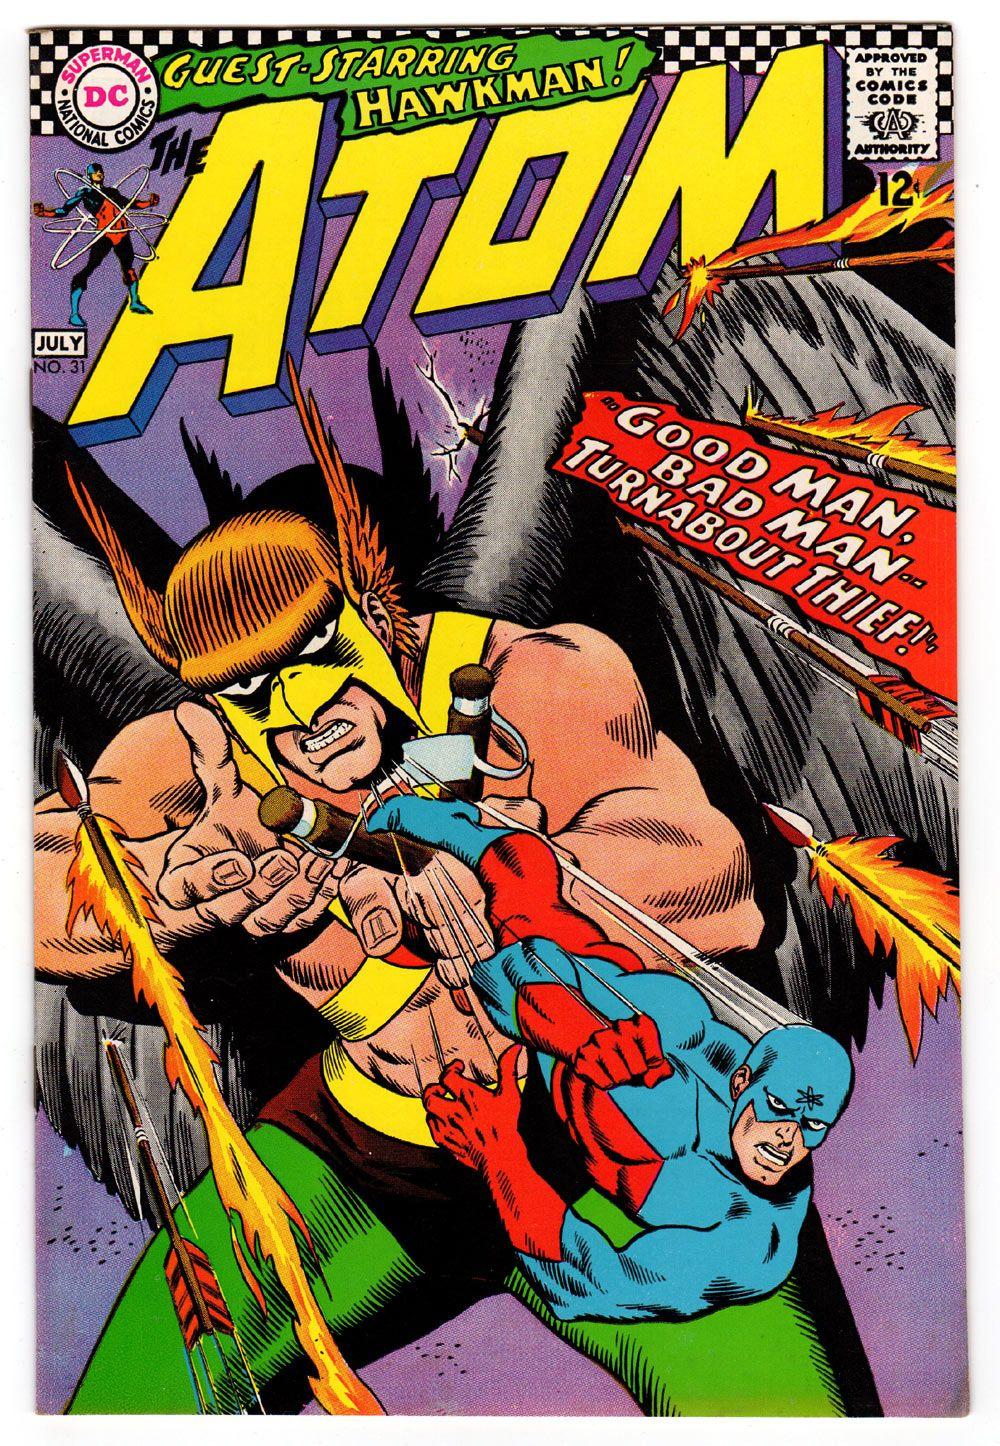 Marvel vs dc villains yahoo dating